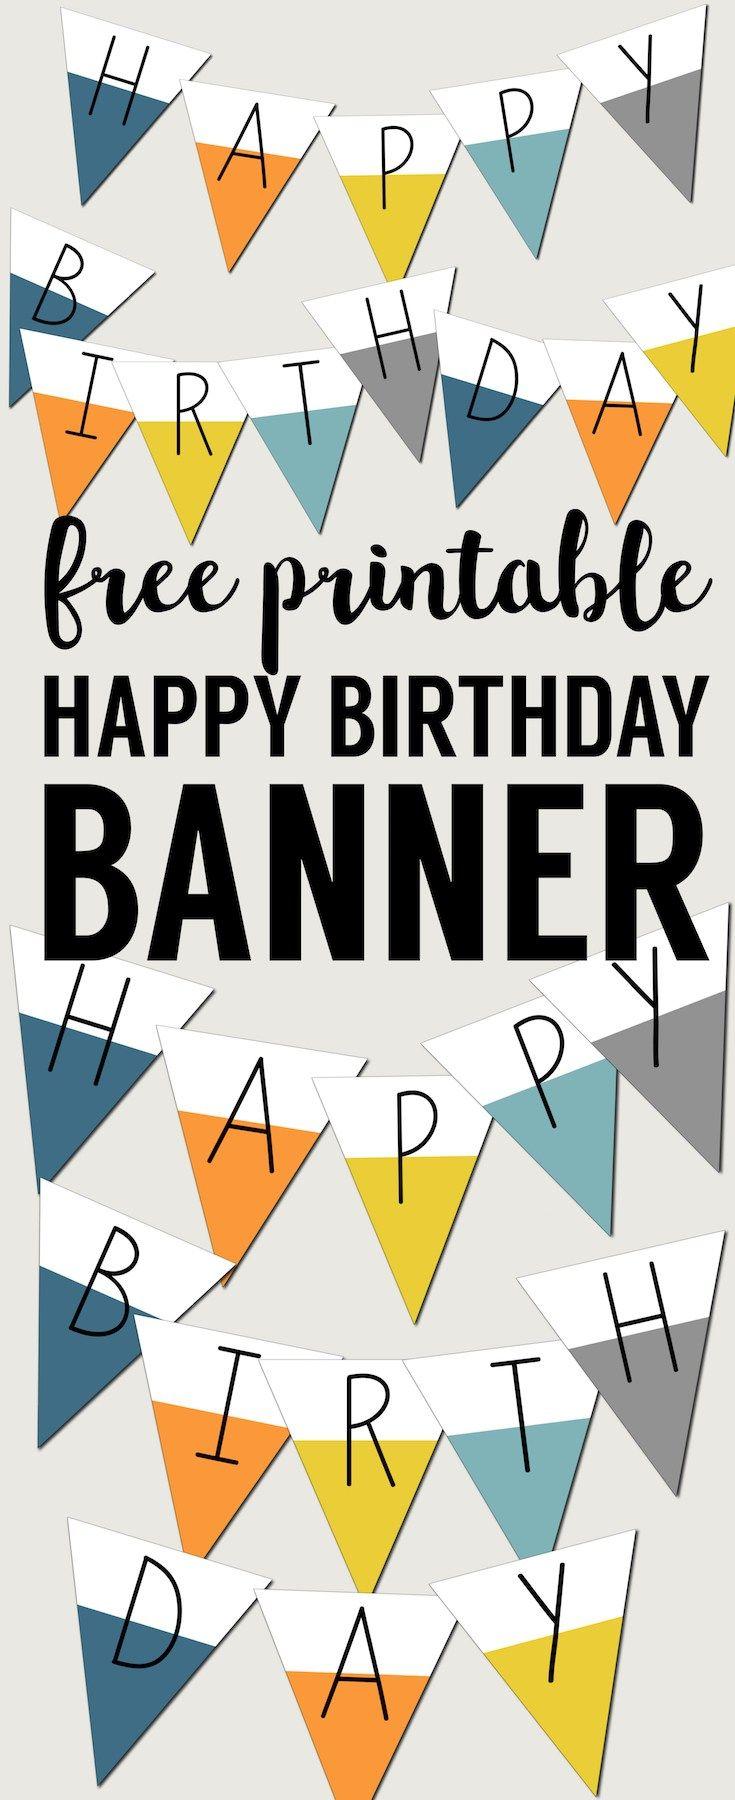 Free Printable Happy Birthday Banner Paper Trail Design Printable Birthday Banner Happy Birthday Signs Happy Birthday Banner Printable